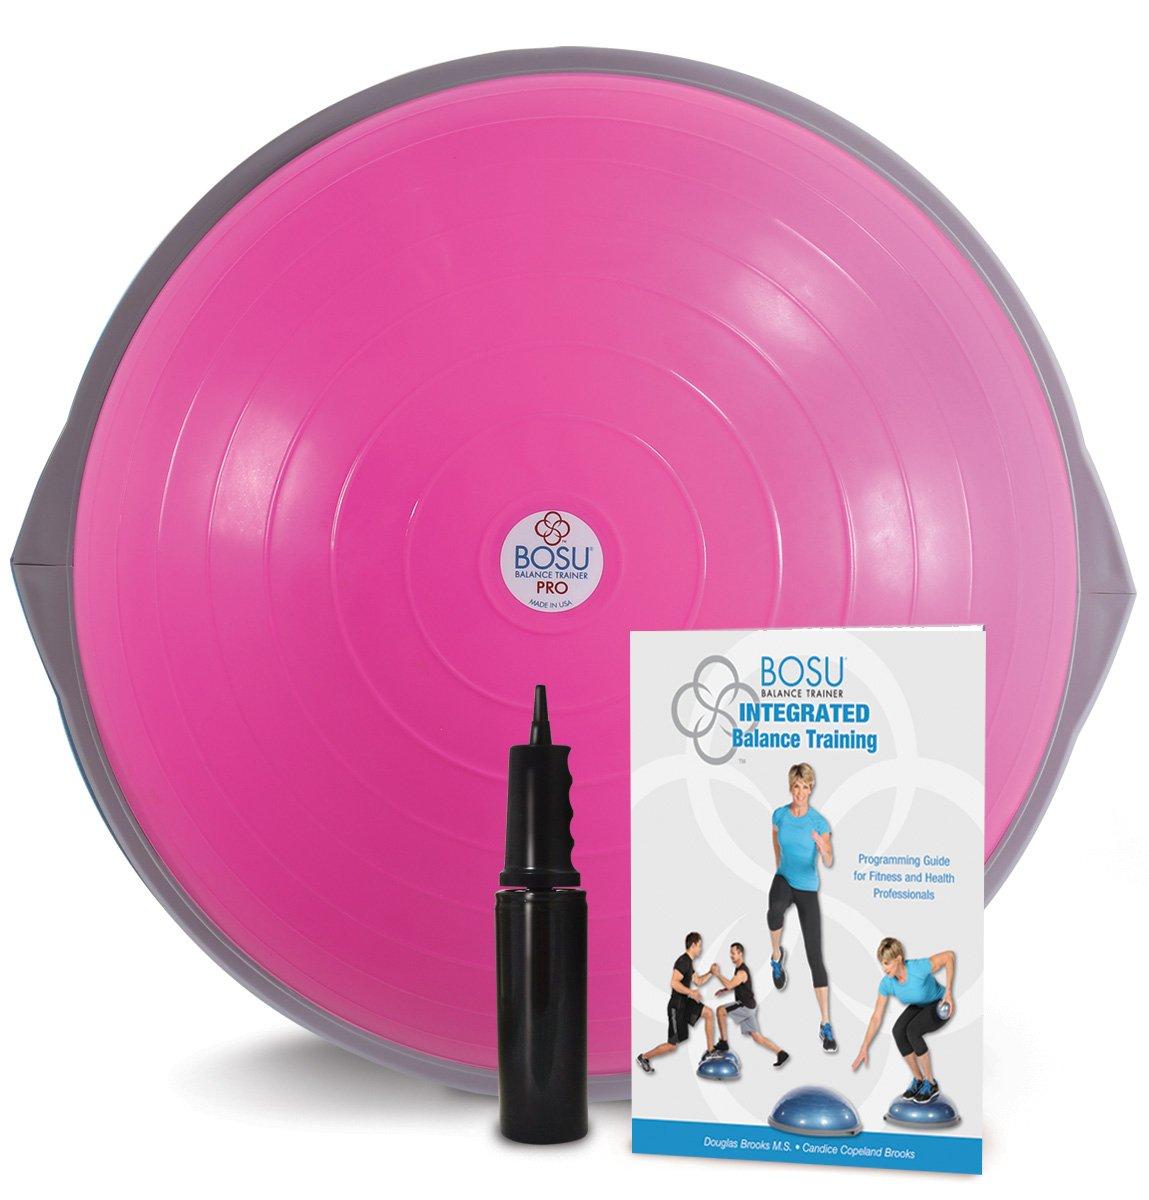 Bosu Pro Balance Trainer Ball Bounce and Sport Inc. 72-10850-P